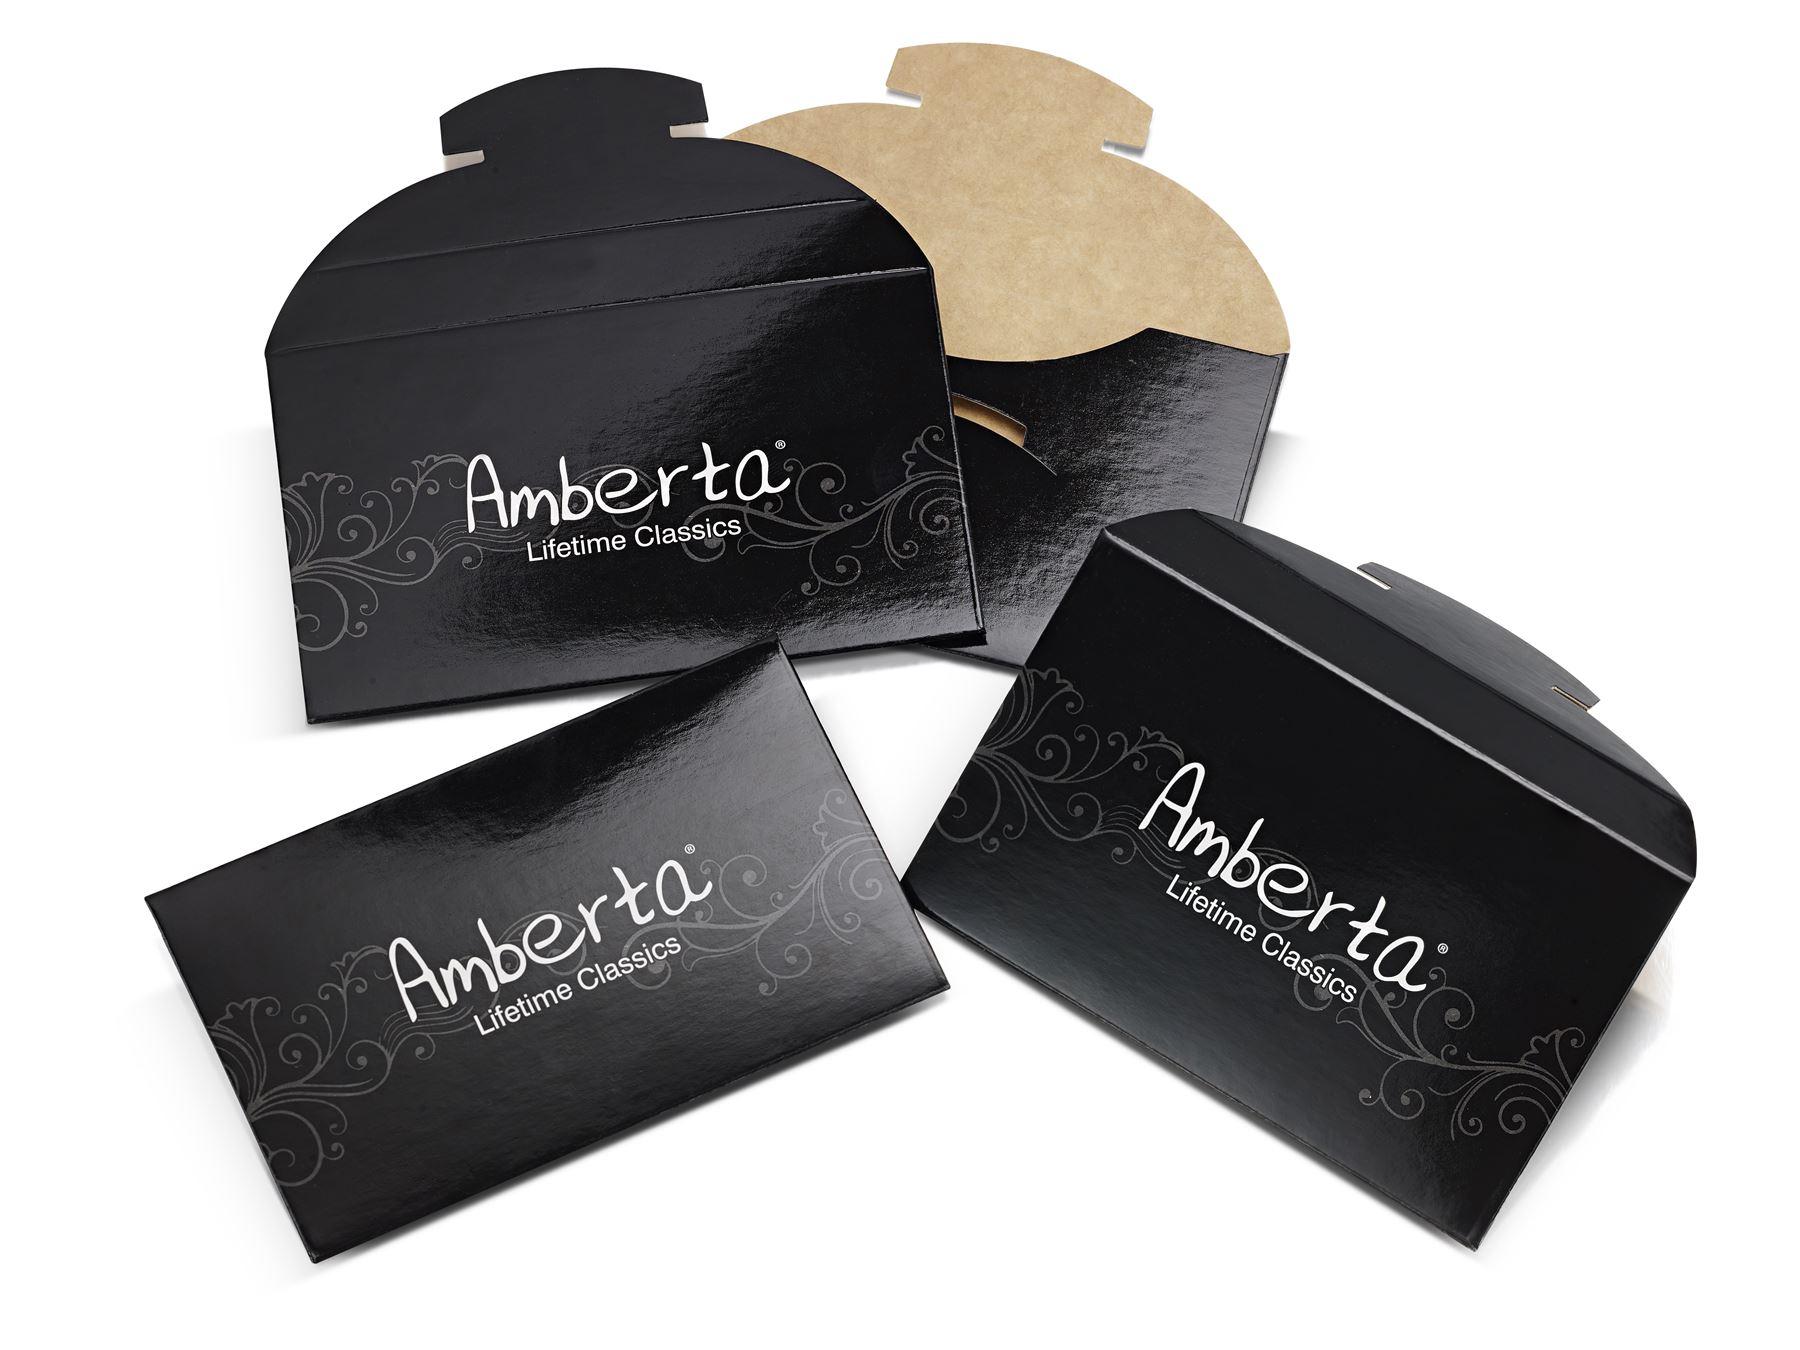 Amberta-Jewelry-925-Sterling-Silver-Adjustable-Bracelet-Italian-Bangle-for-Women thumbnail 43